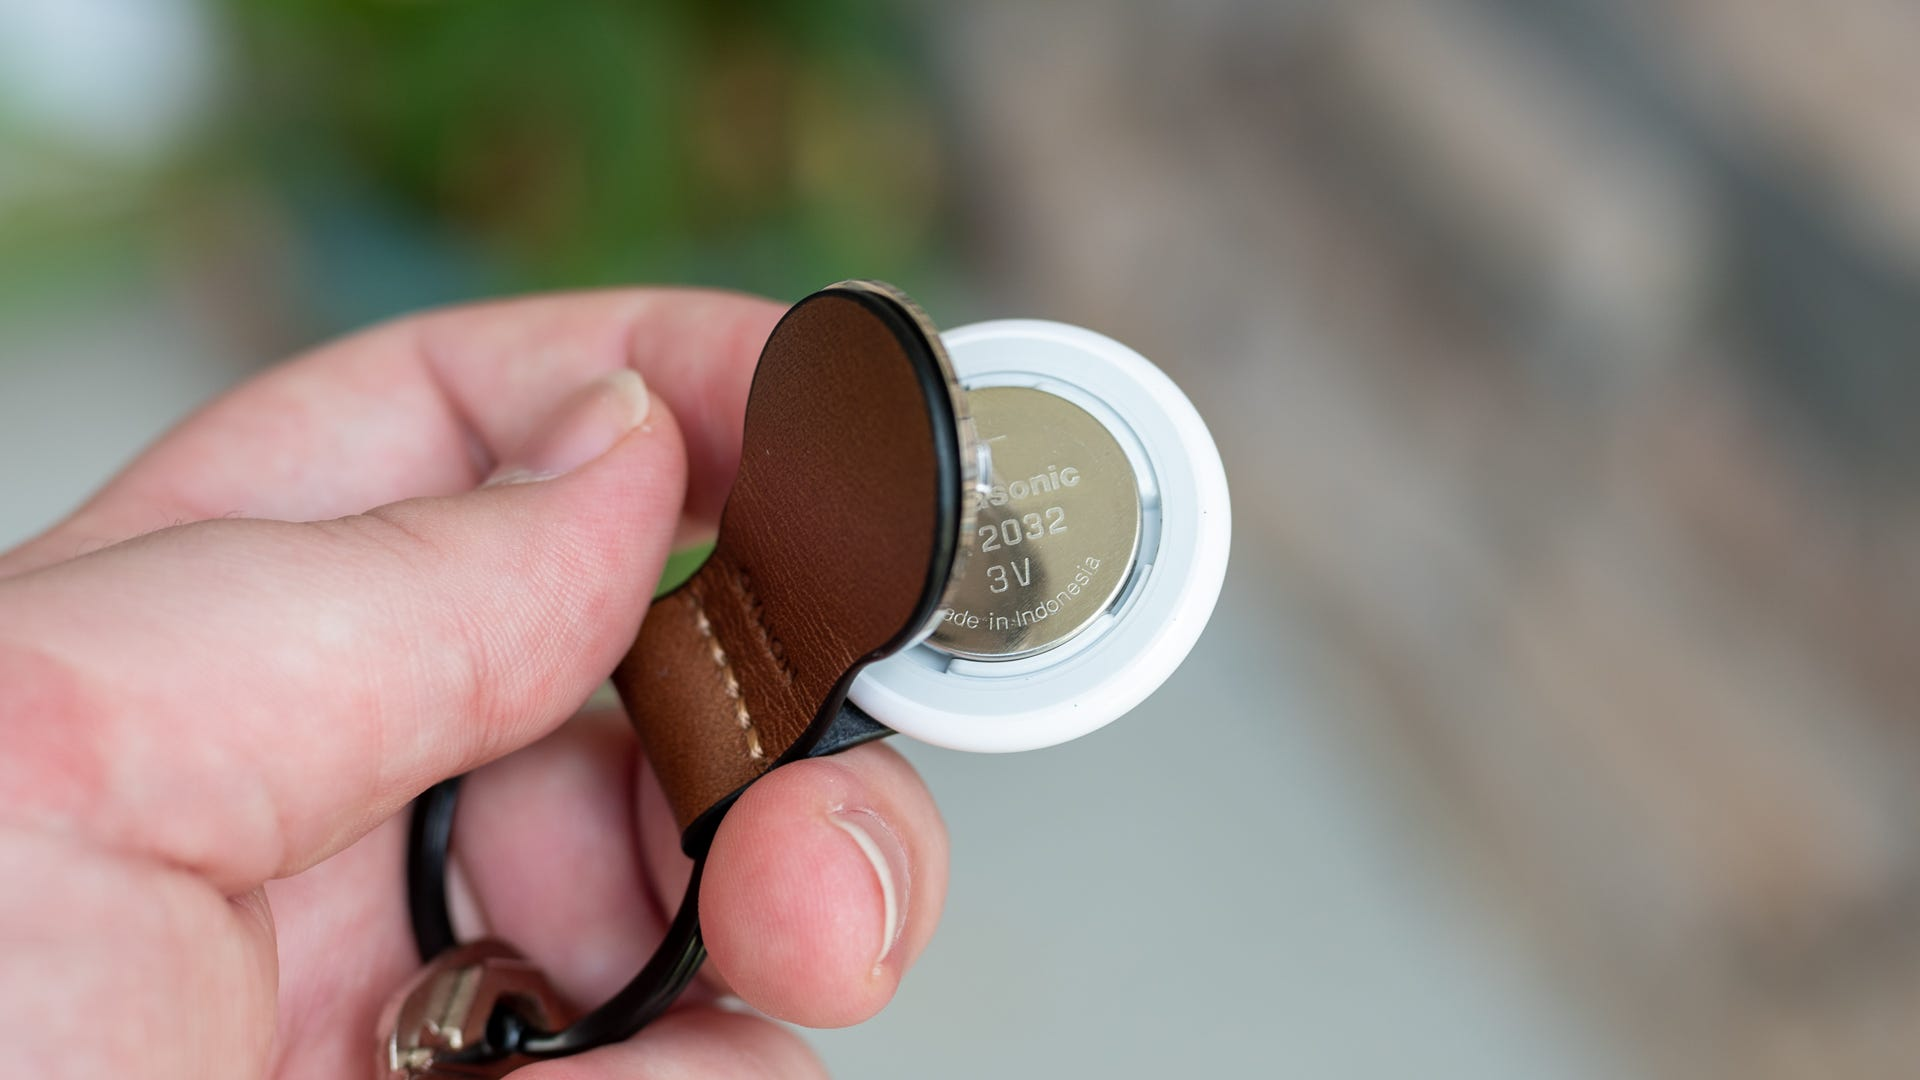 Nomad AirTag Leather Loop înlocuind bateria